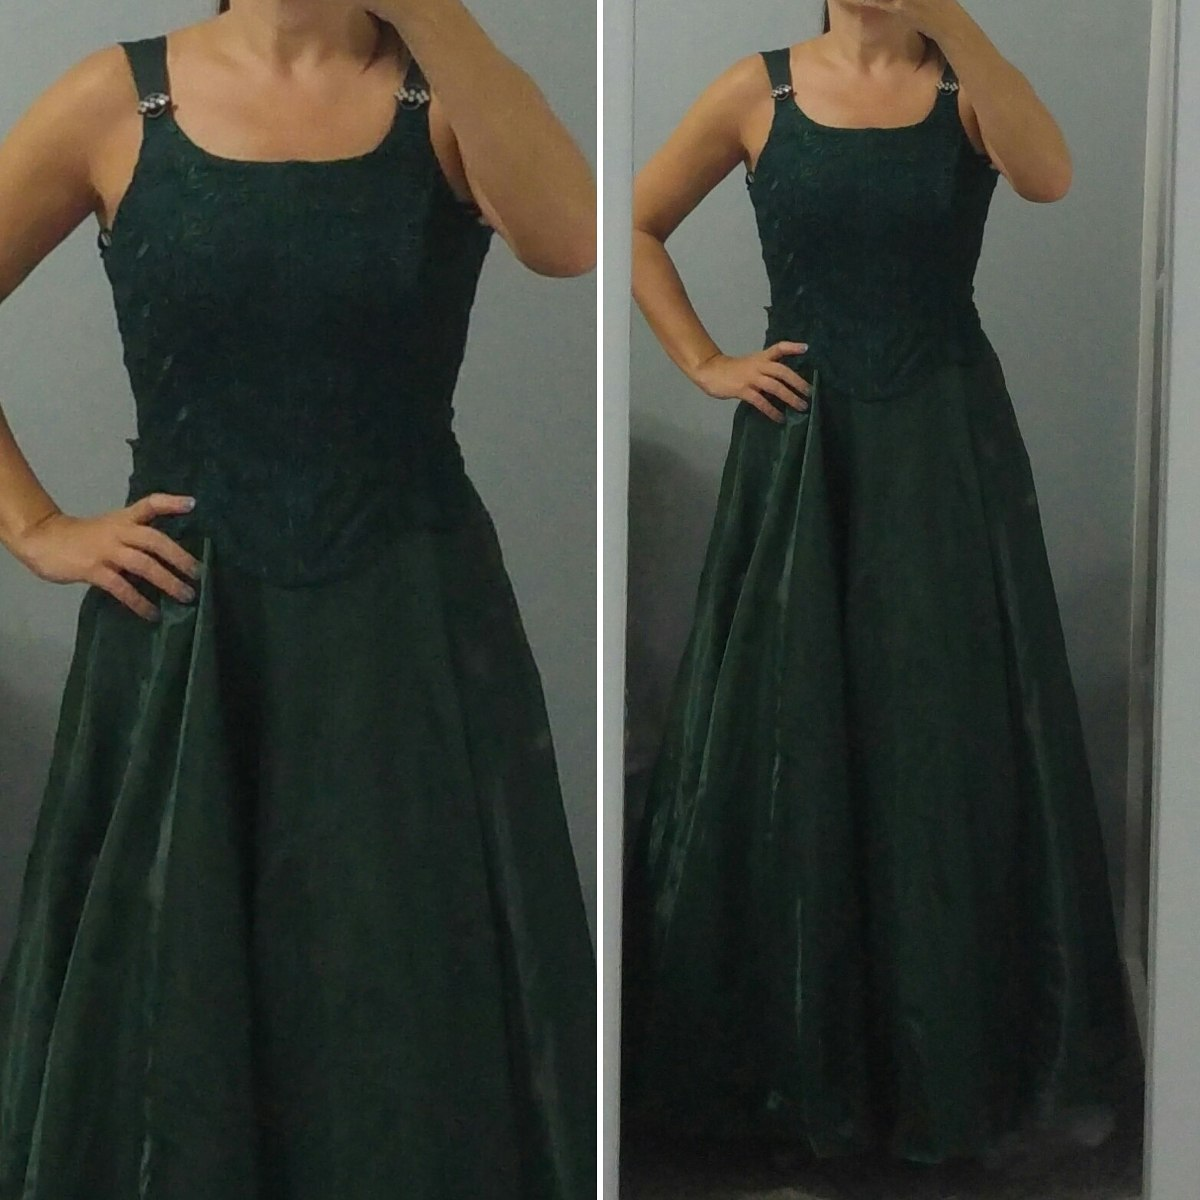 Vestido de festa verde mercado livre